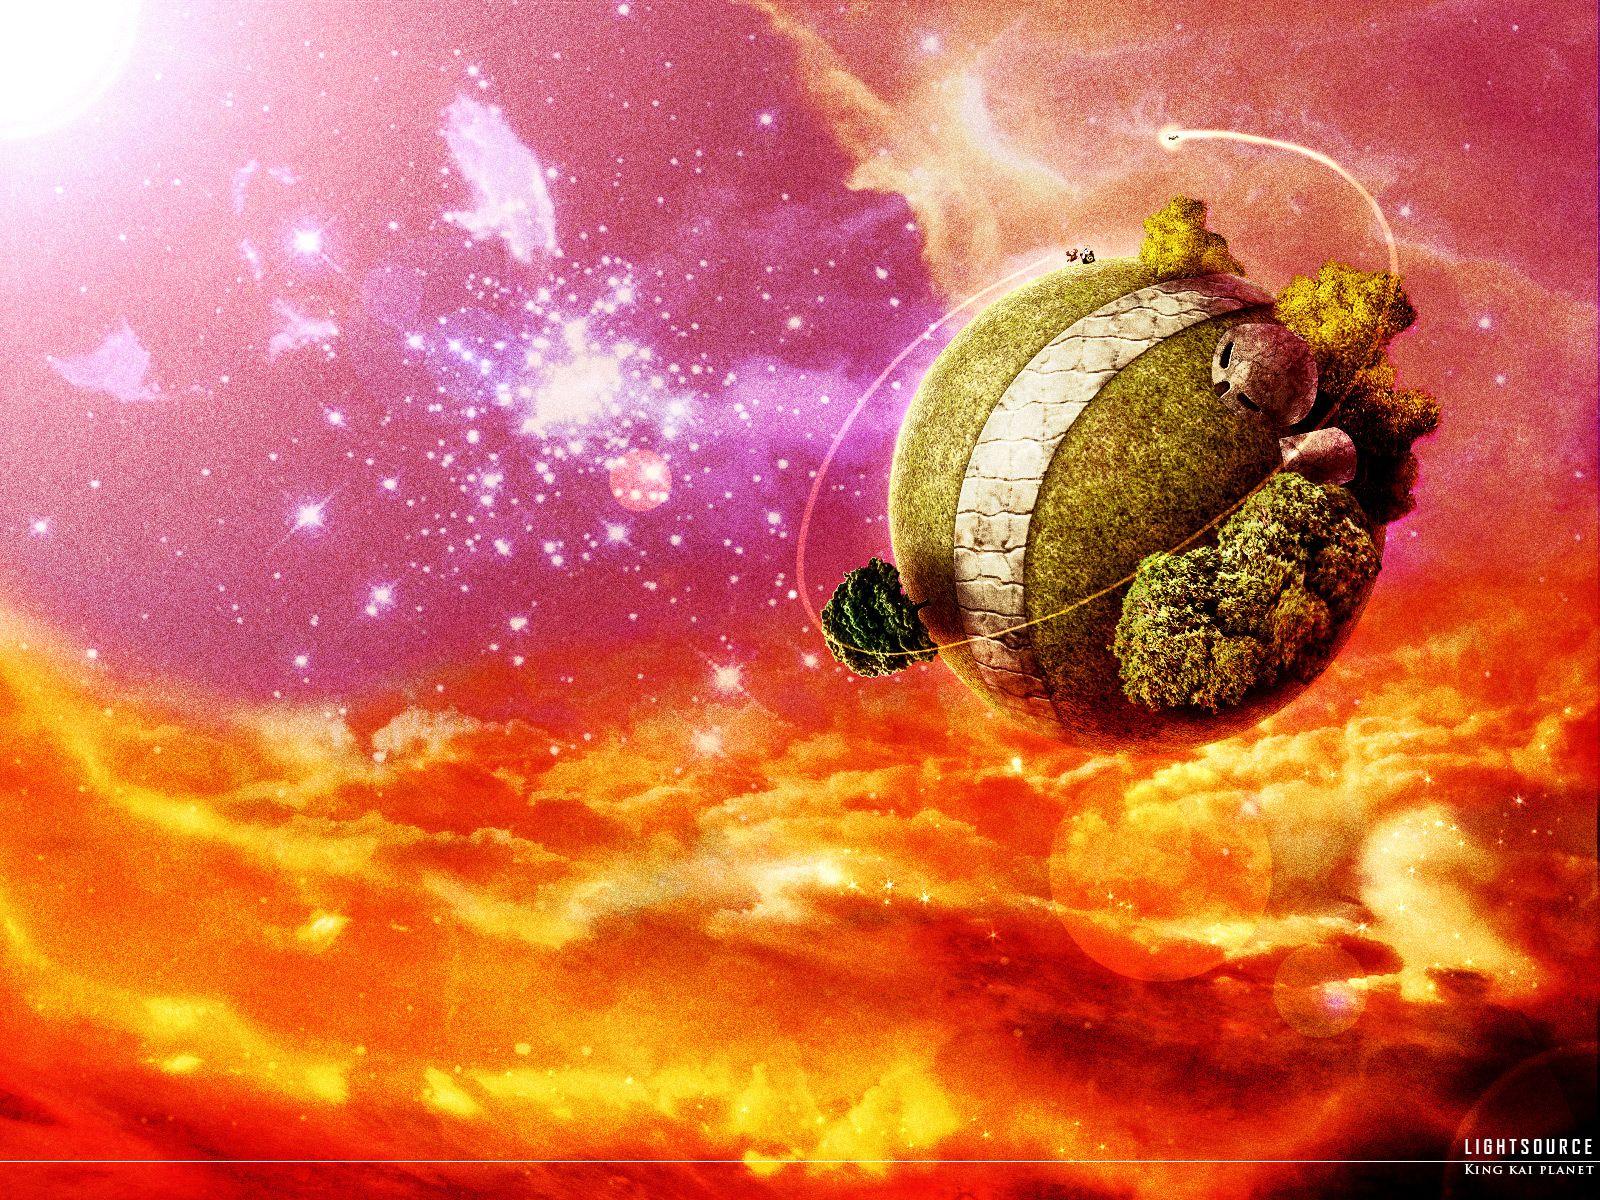 Dbz Landscape ドラゴンボール 写真集 ドラゴンボールz